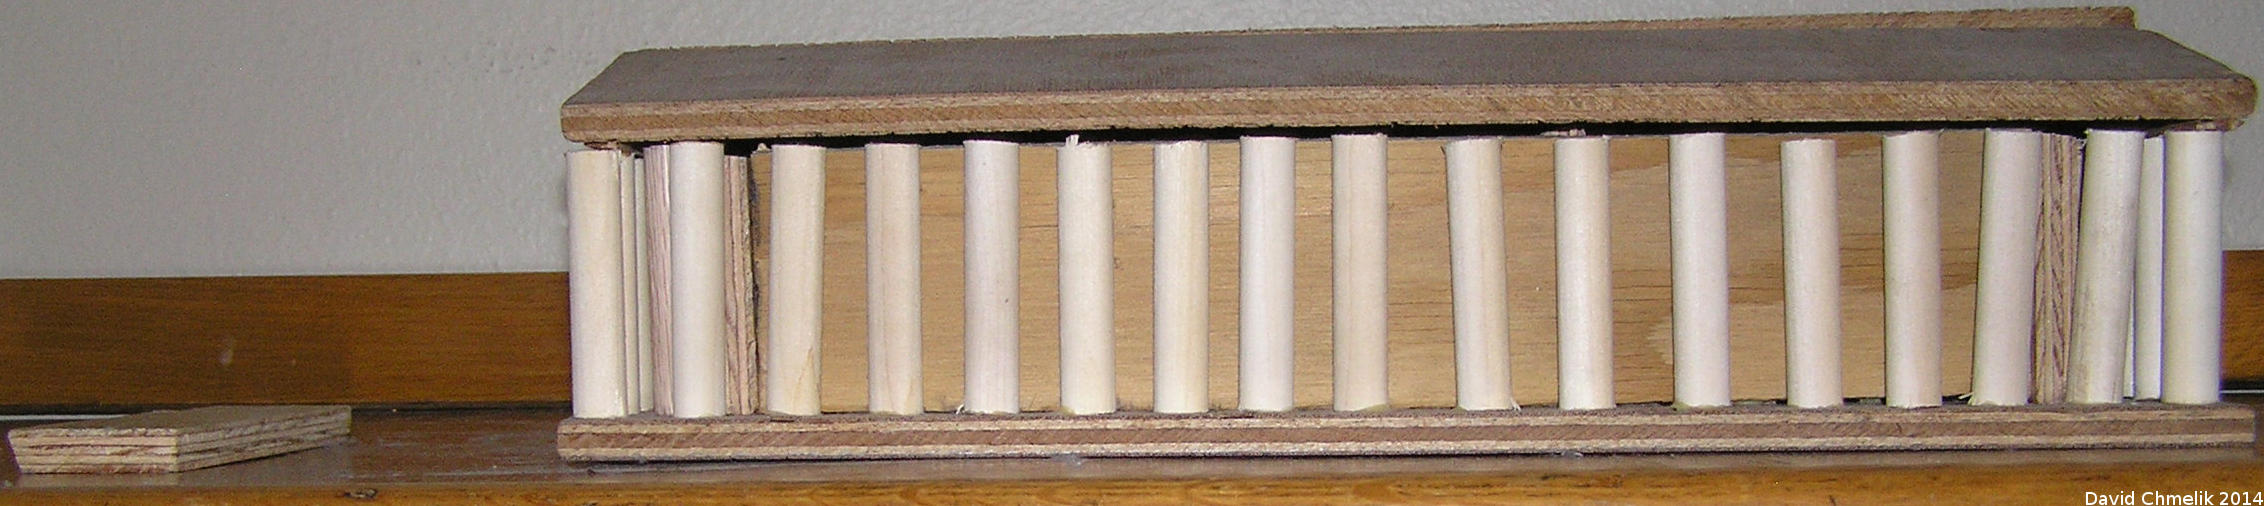 The Parthenon (long) by dchmelik